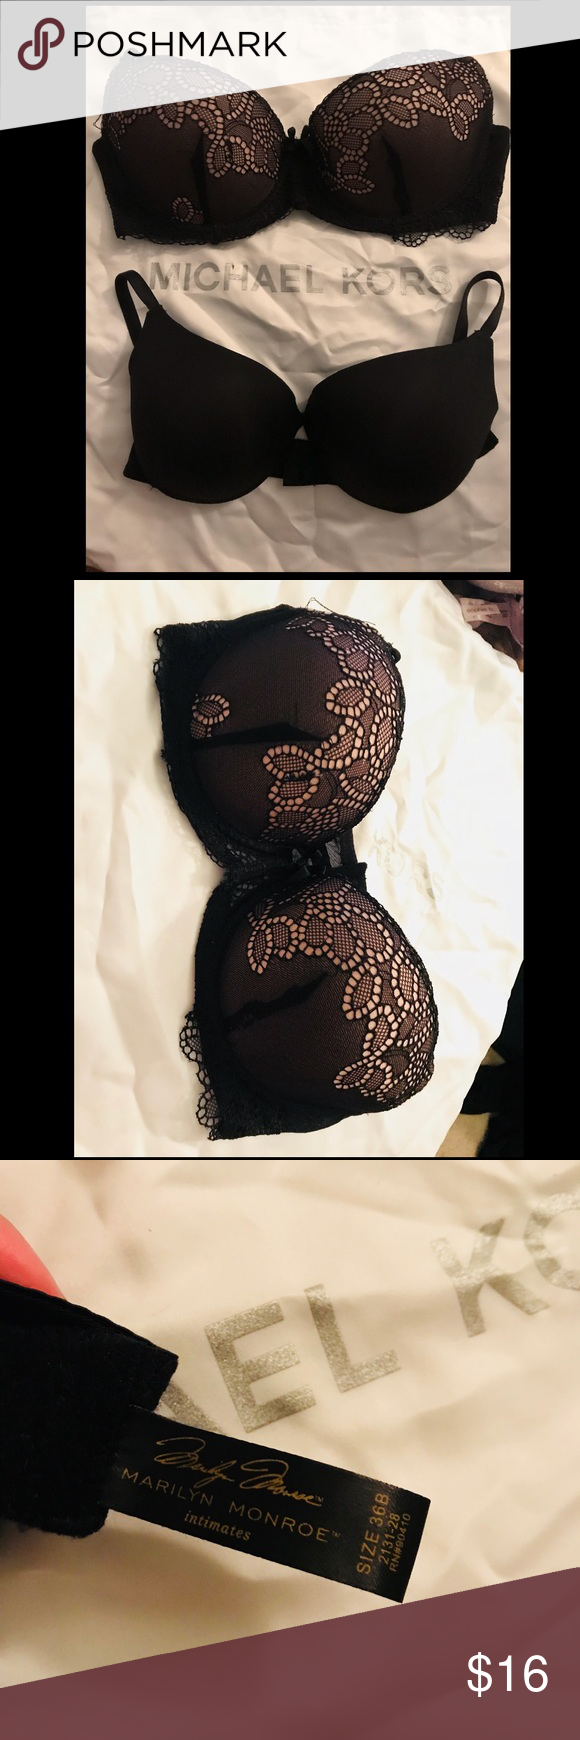 8ff62e1ecc49d NWOT🖤TWO BRAS 36B Cute Marilyn Monroe Push up Bra size 36B new without tags